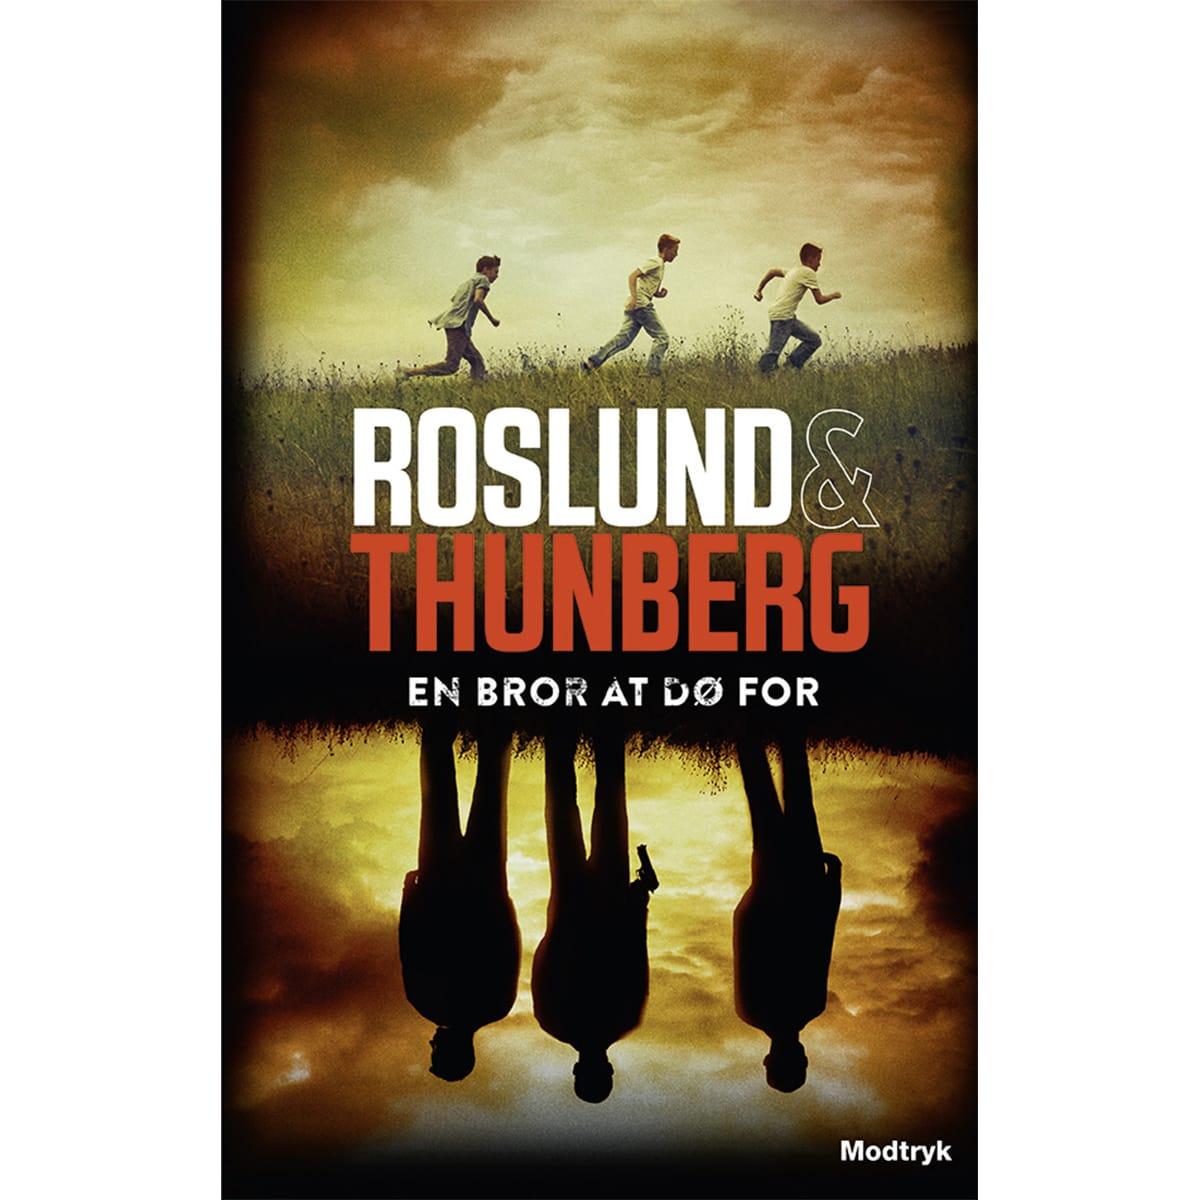 Af Anders Roslund & Stefan Thunberg